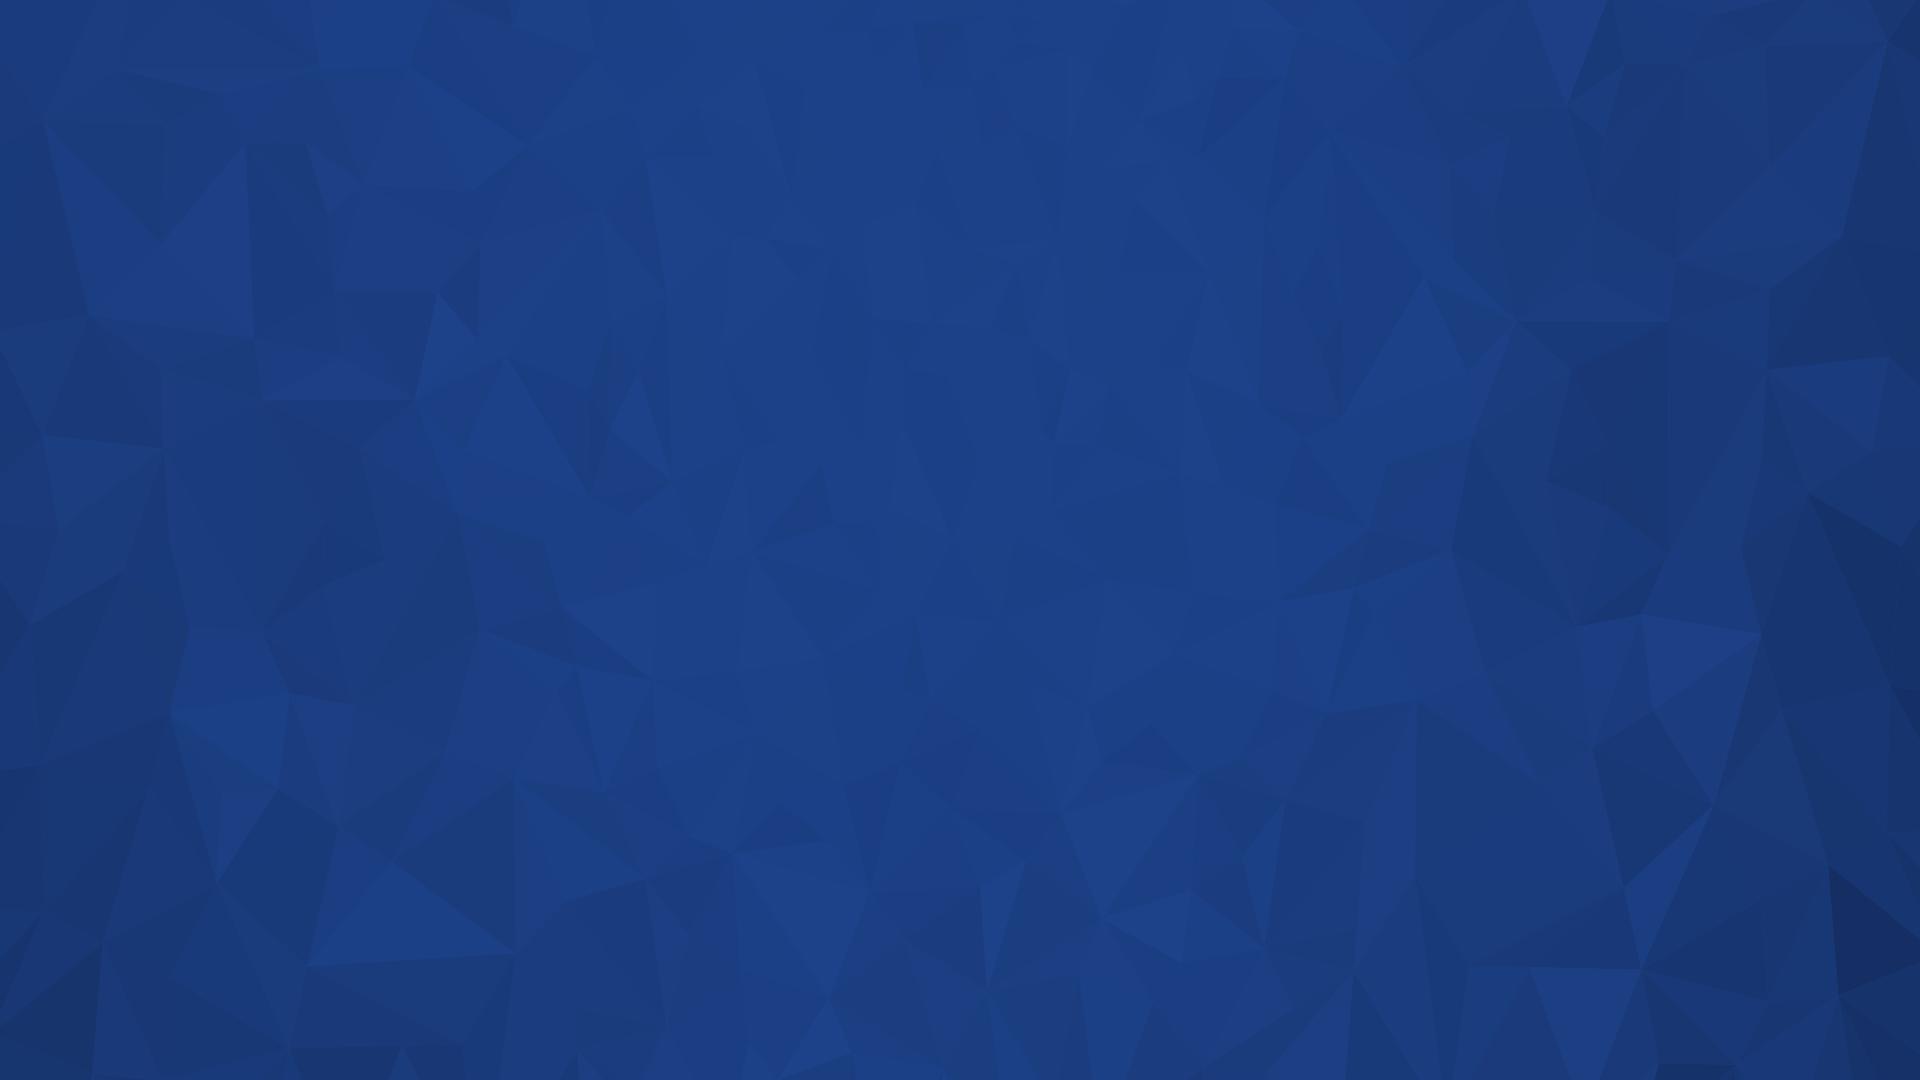 background-setra-blue-shapes